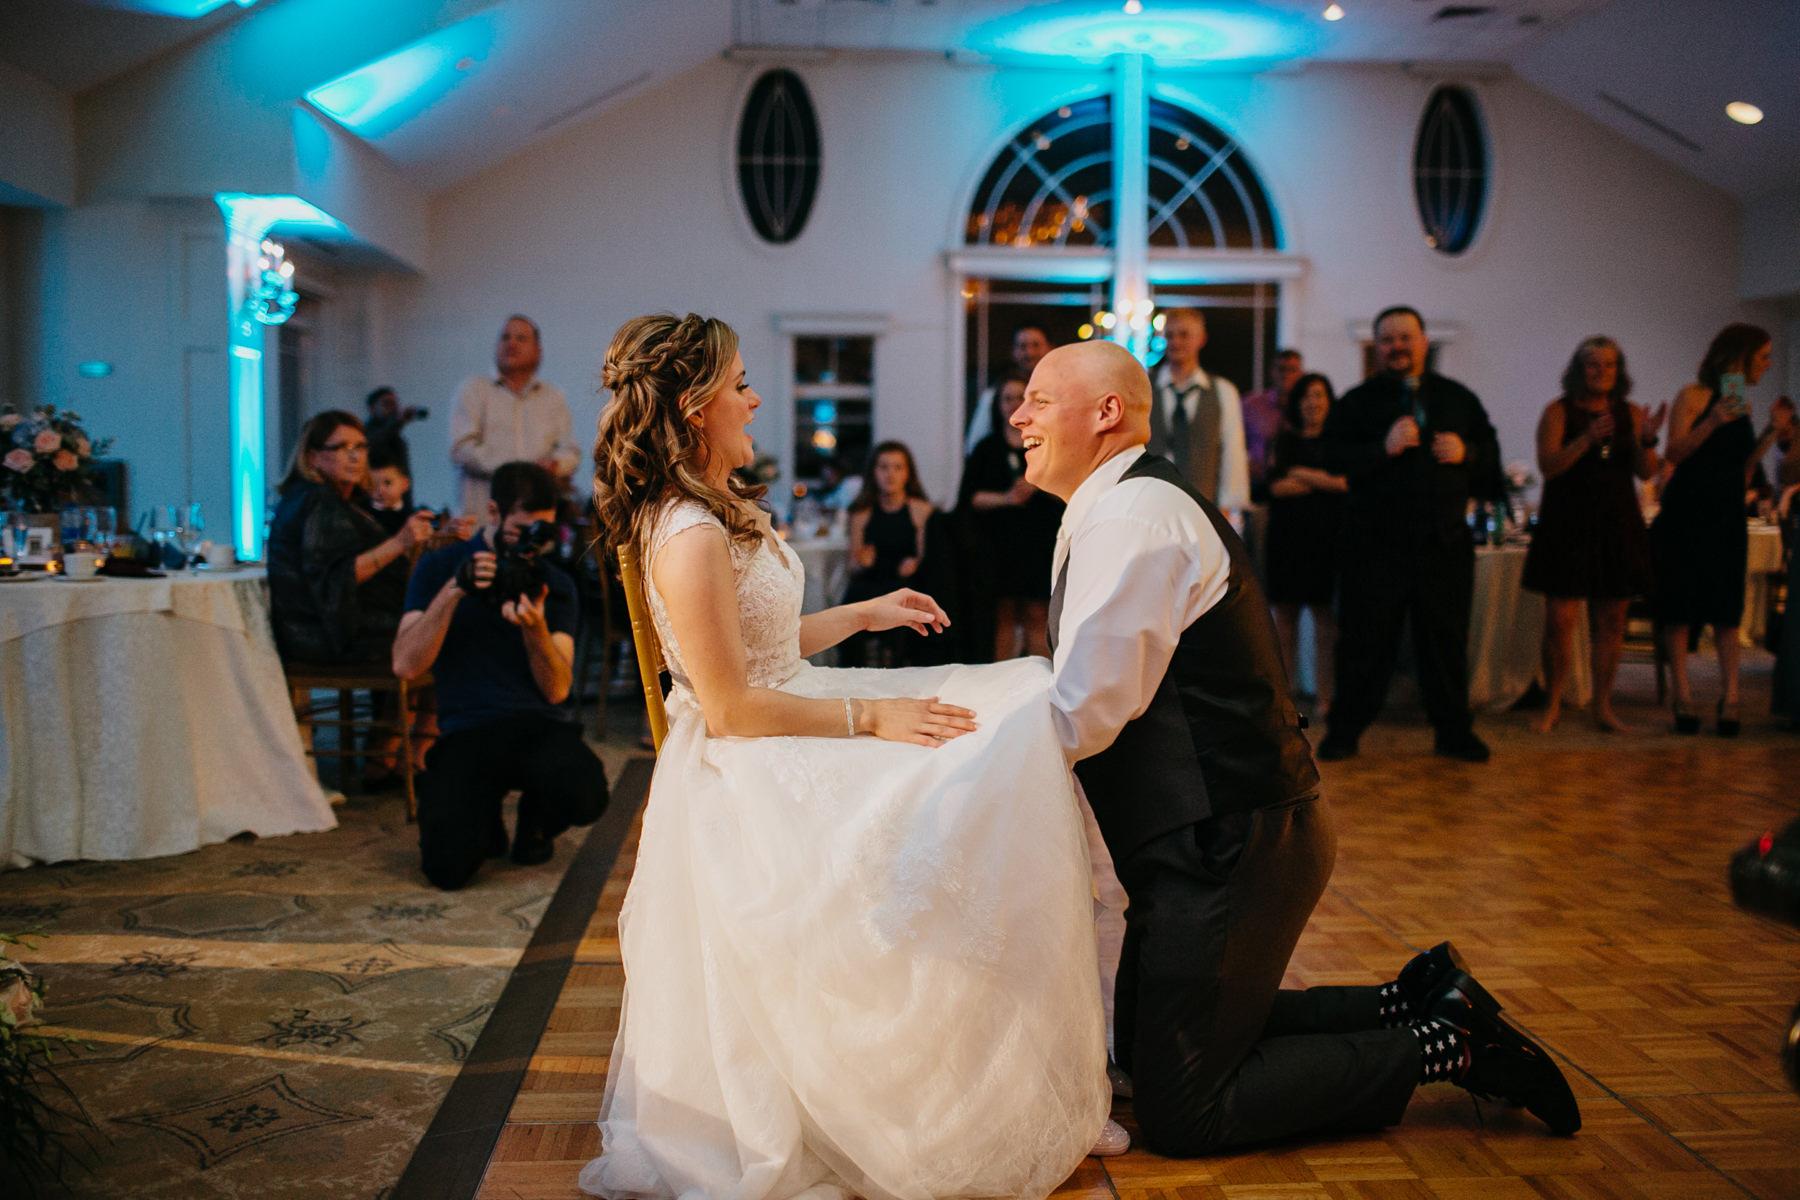 Quincy Ma Massachusetts Wedding Dedham Boston Granie Links Wedding New England Catholic Cathedral Liz Osban Photography 130.jpg